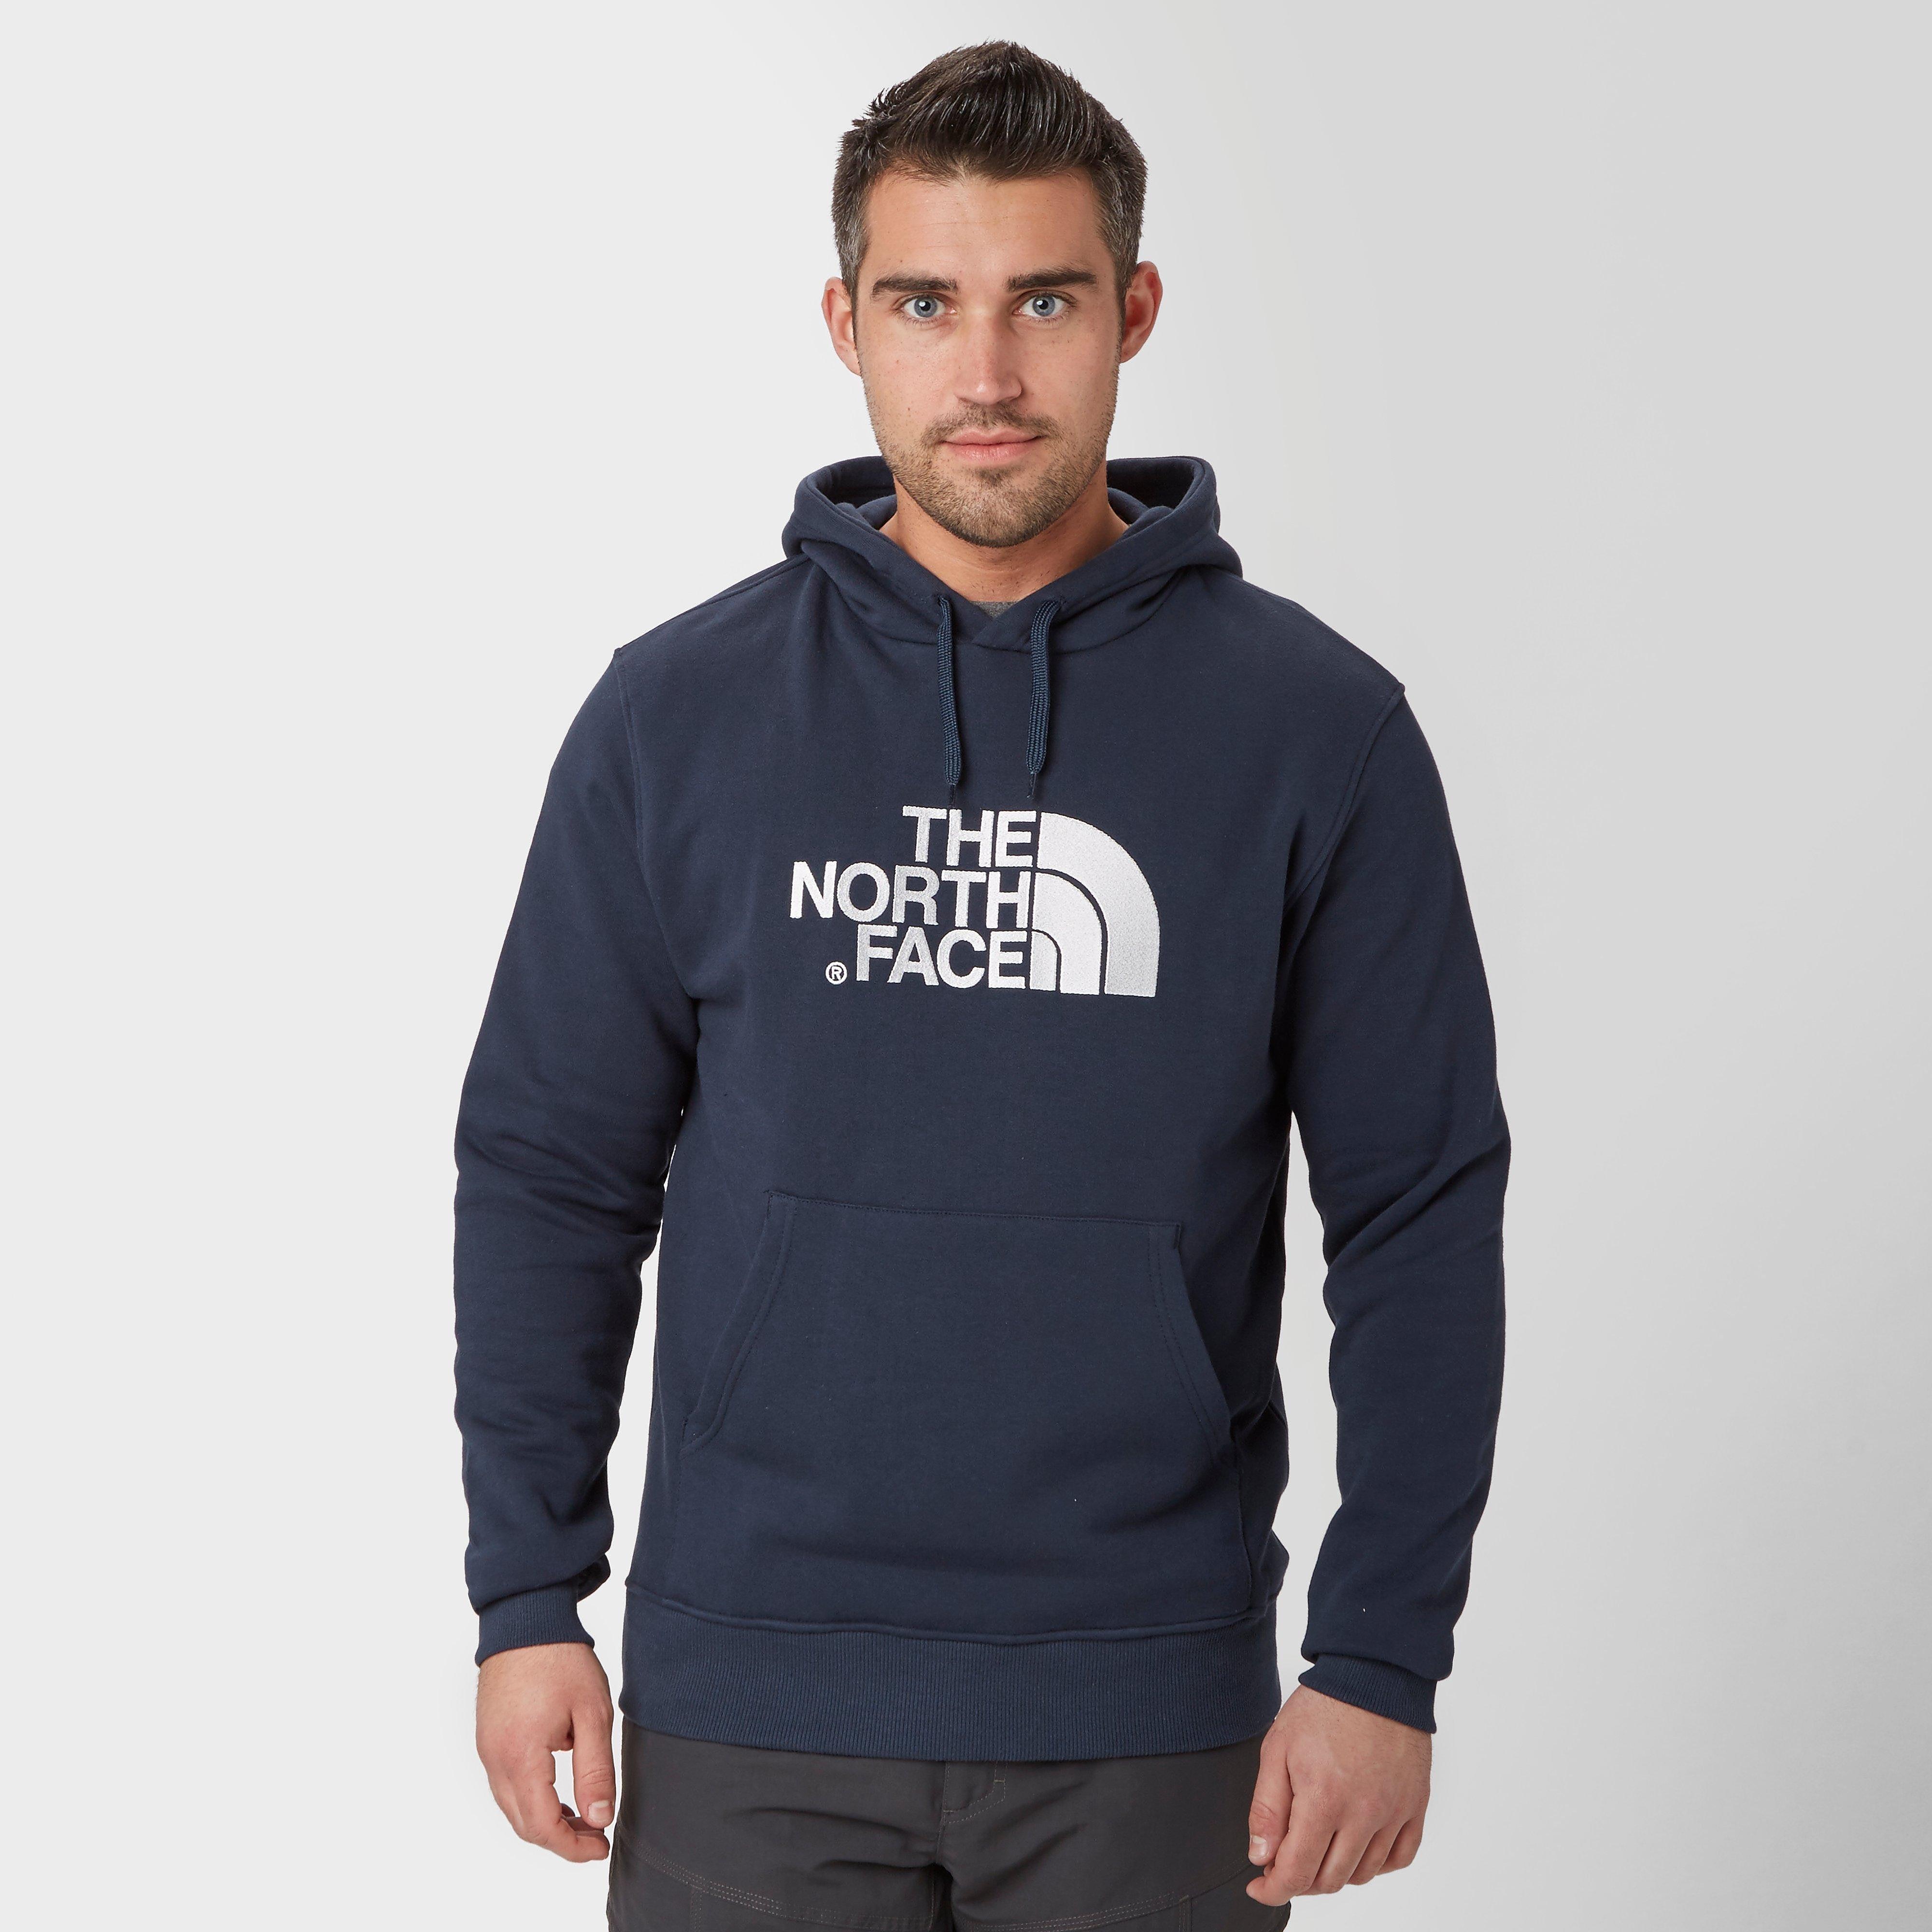 The North Face Drew Peak Men's Hoodie